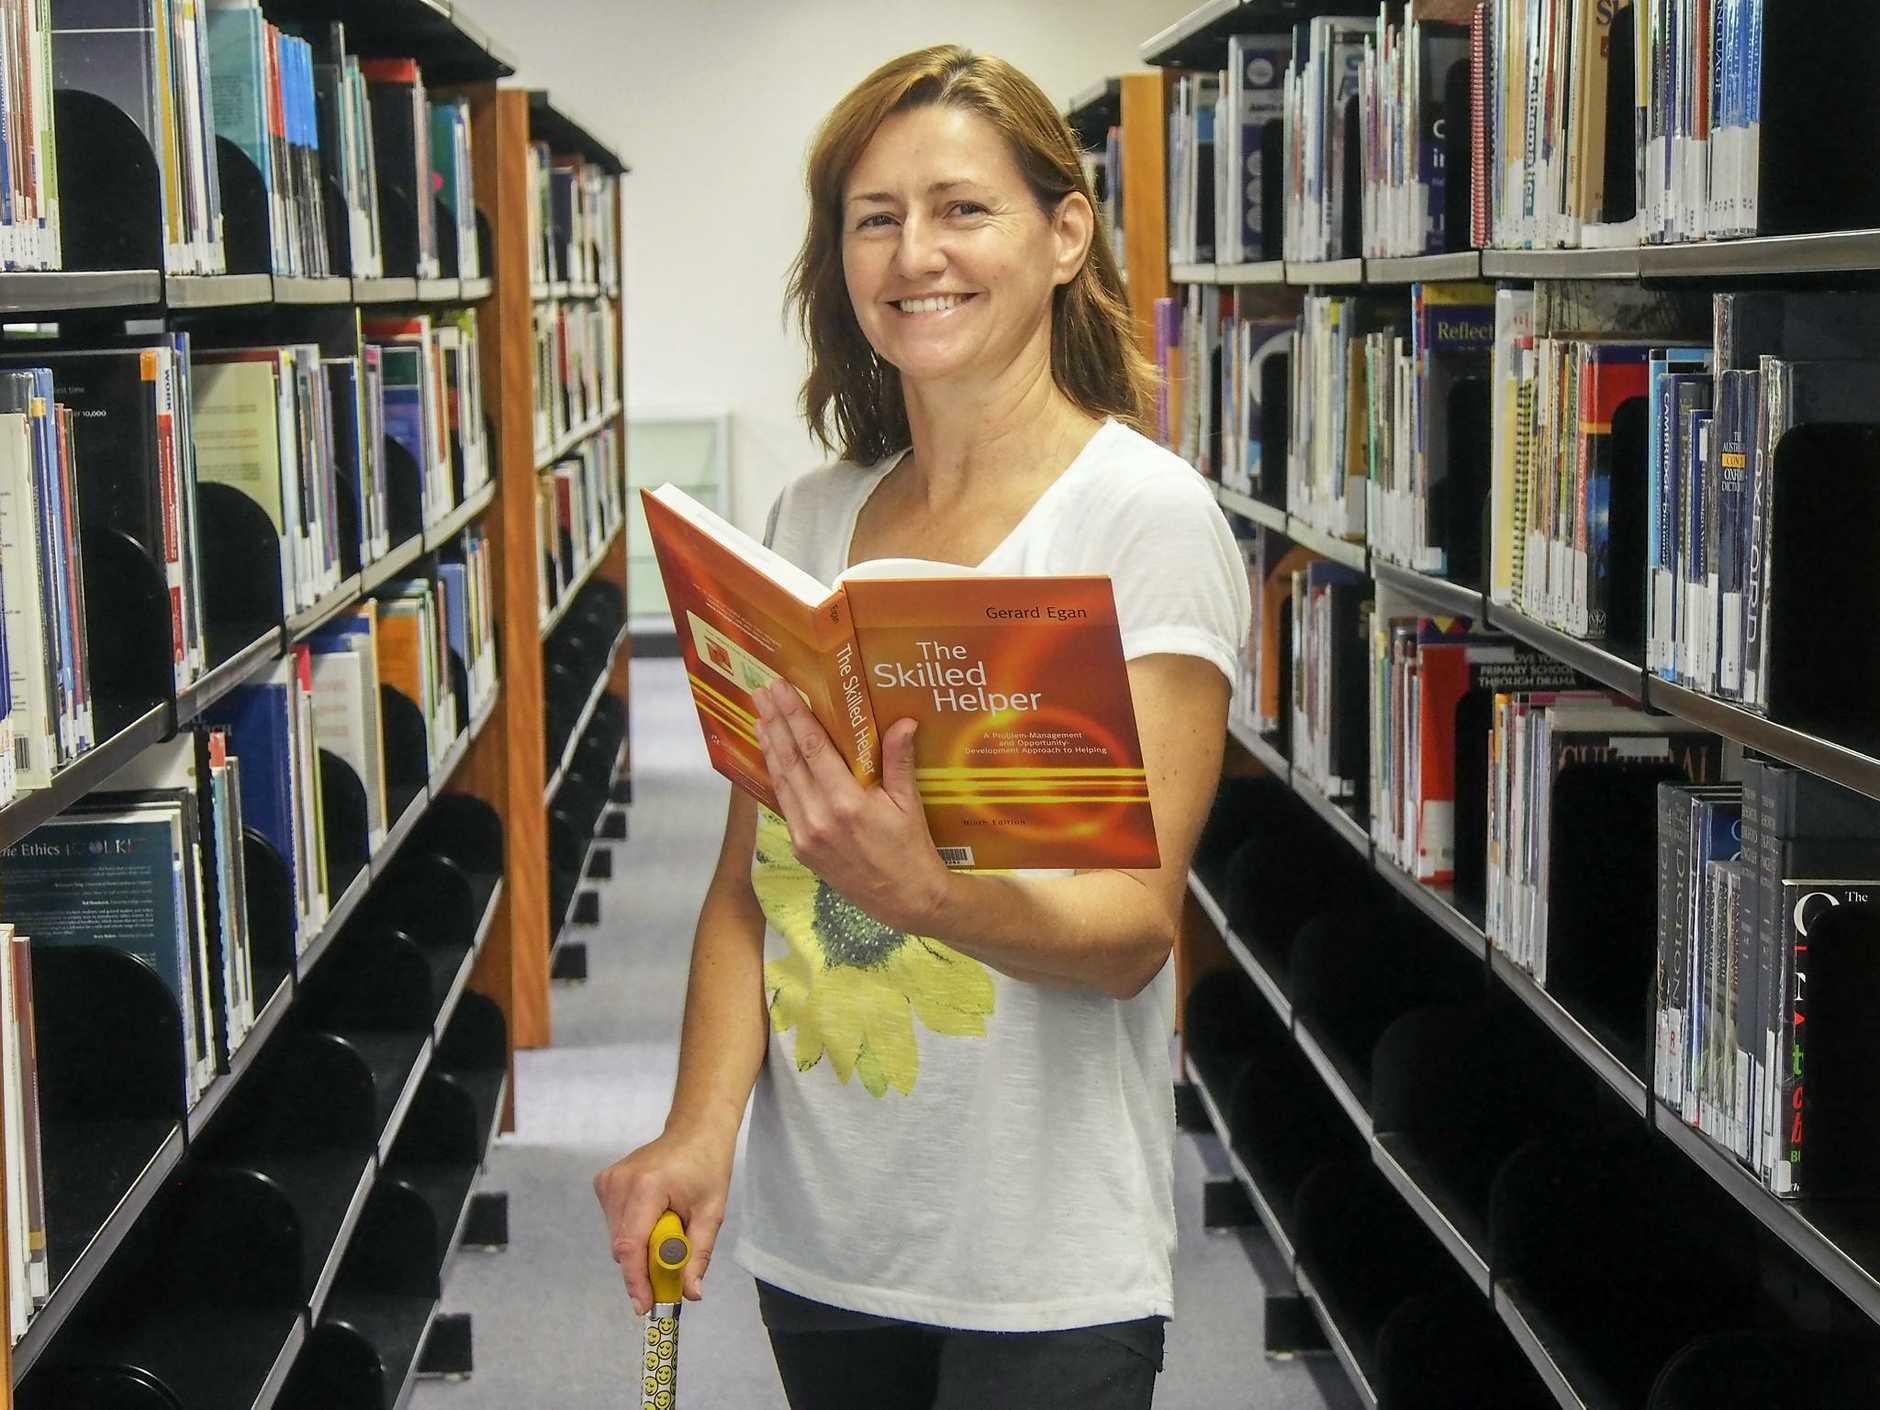 INSPIRING: Megan Collis has started a Graduate Diploma of Counselling at USQ this semester.